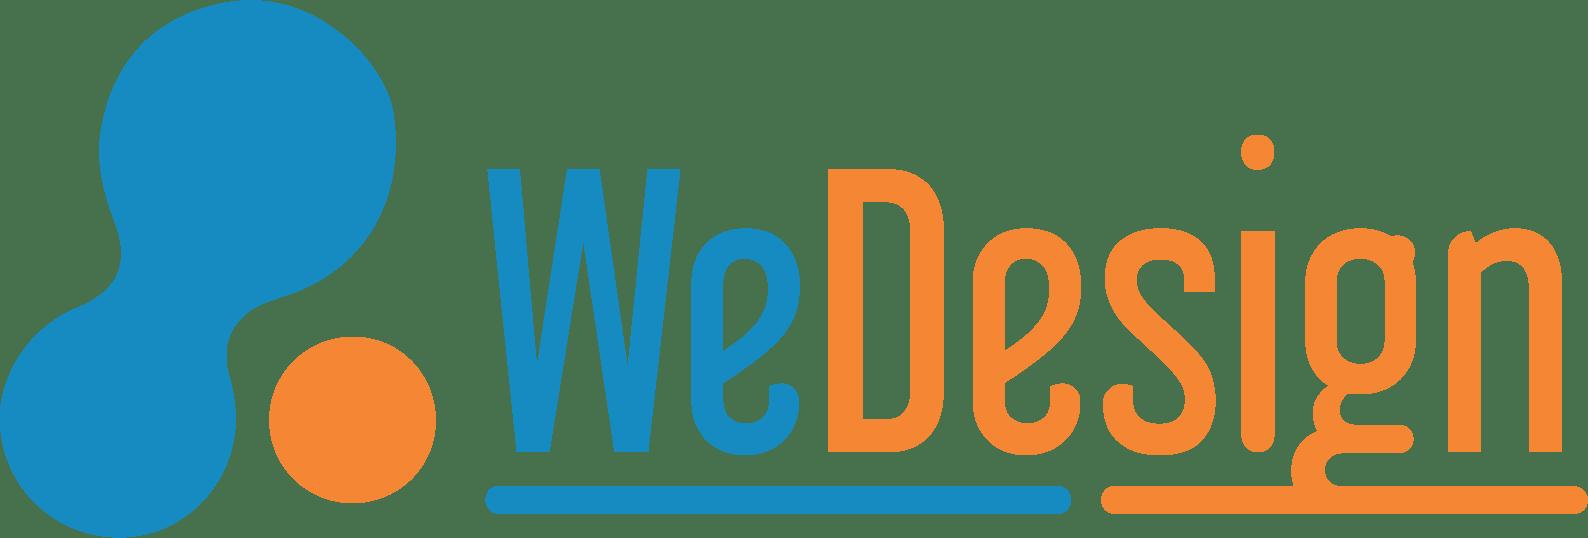 Wedesign Web Design, Digital Marketing, E-Commerce, Branding, Creative Design, Website Maintenance., Training Services, Migher World